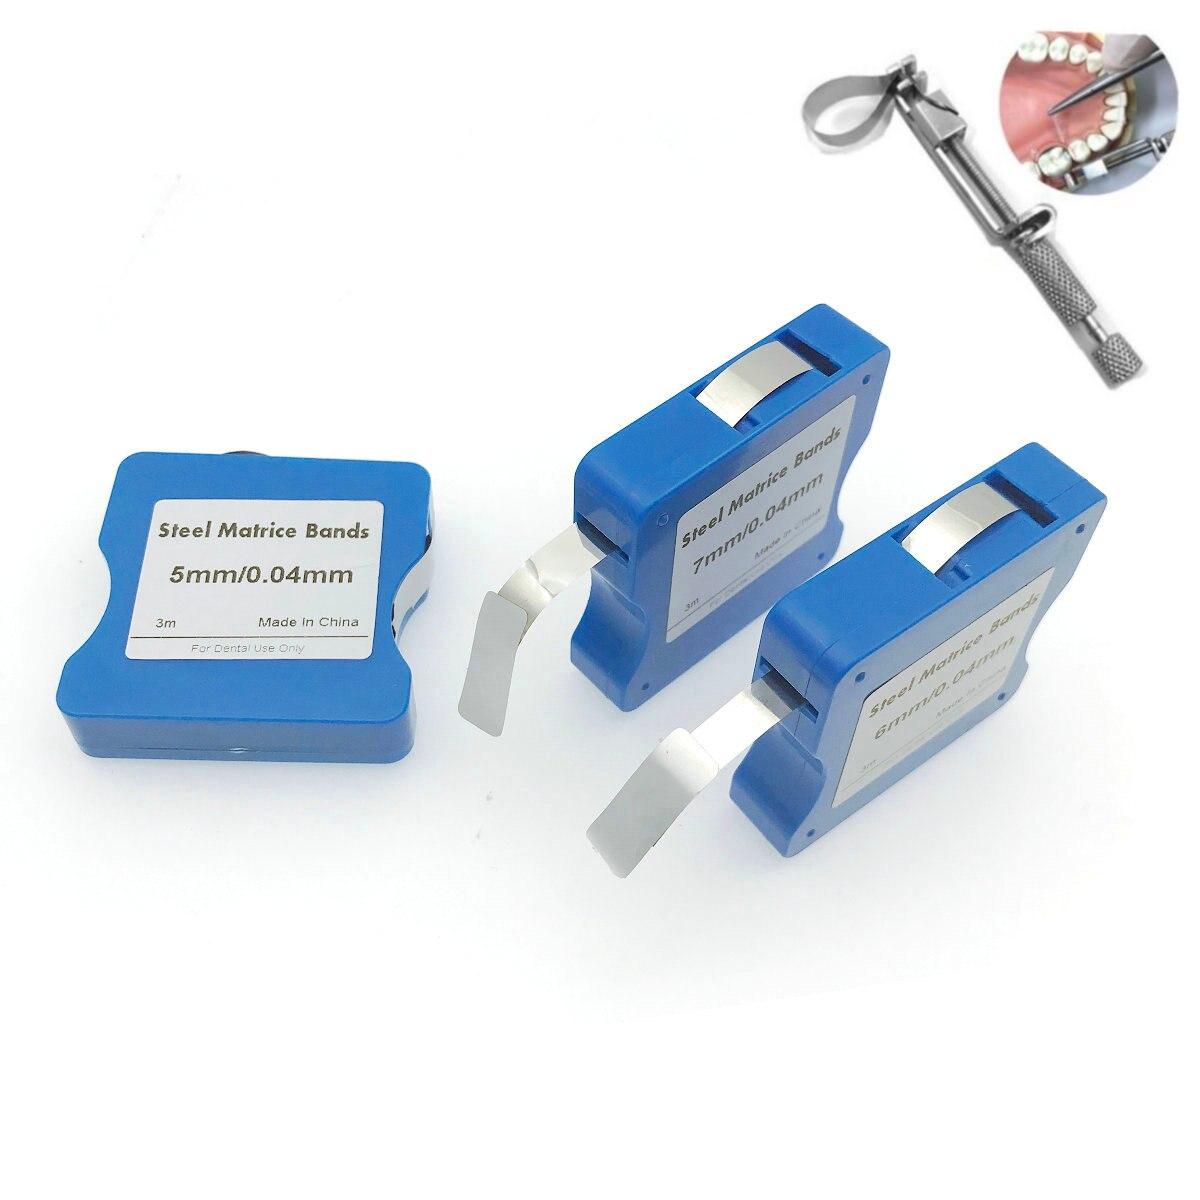 Dental Stainless Steel/Resin Film Restoration Light Cured Resin Clear Matrix Bands 5mm/6mm/7mm Width 0.025mm Matrix Strips